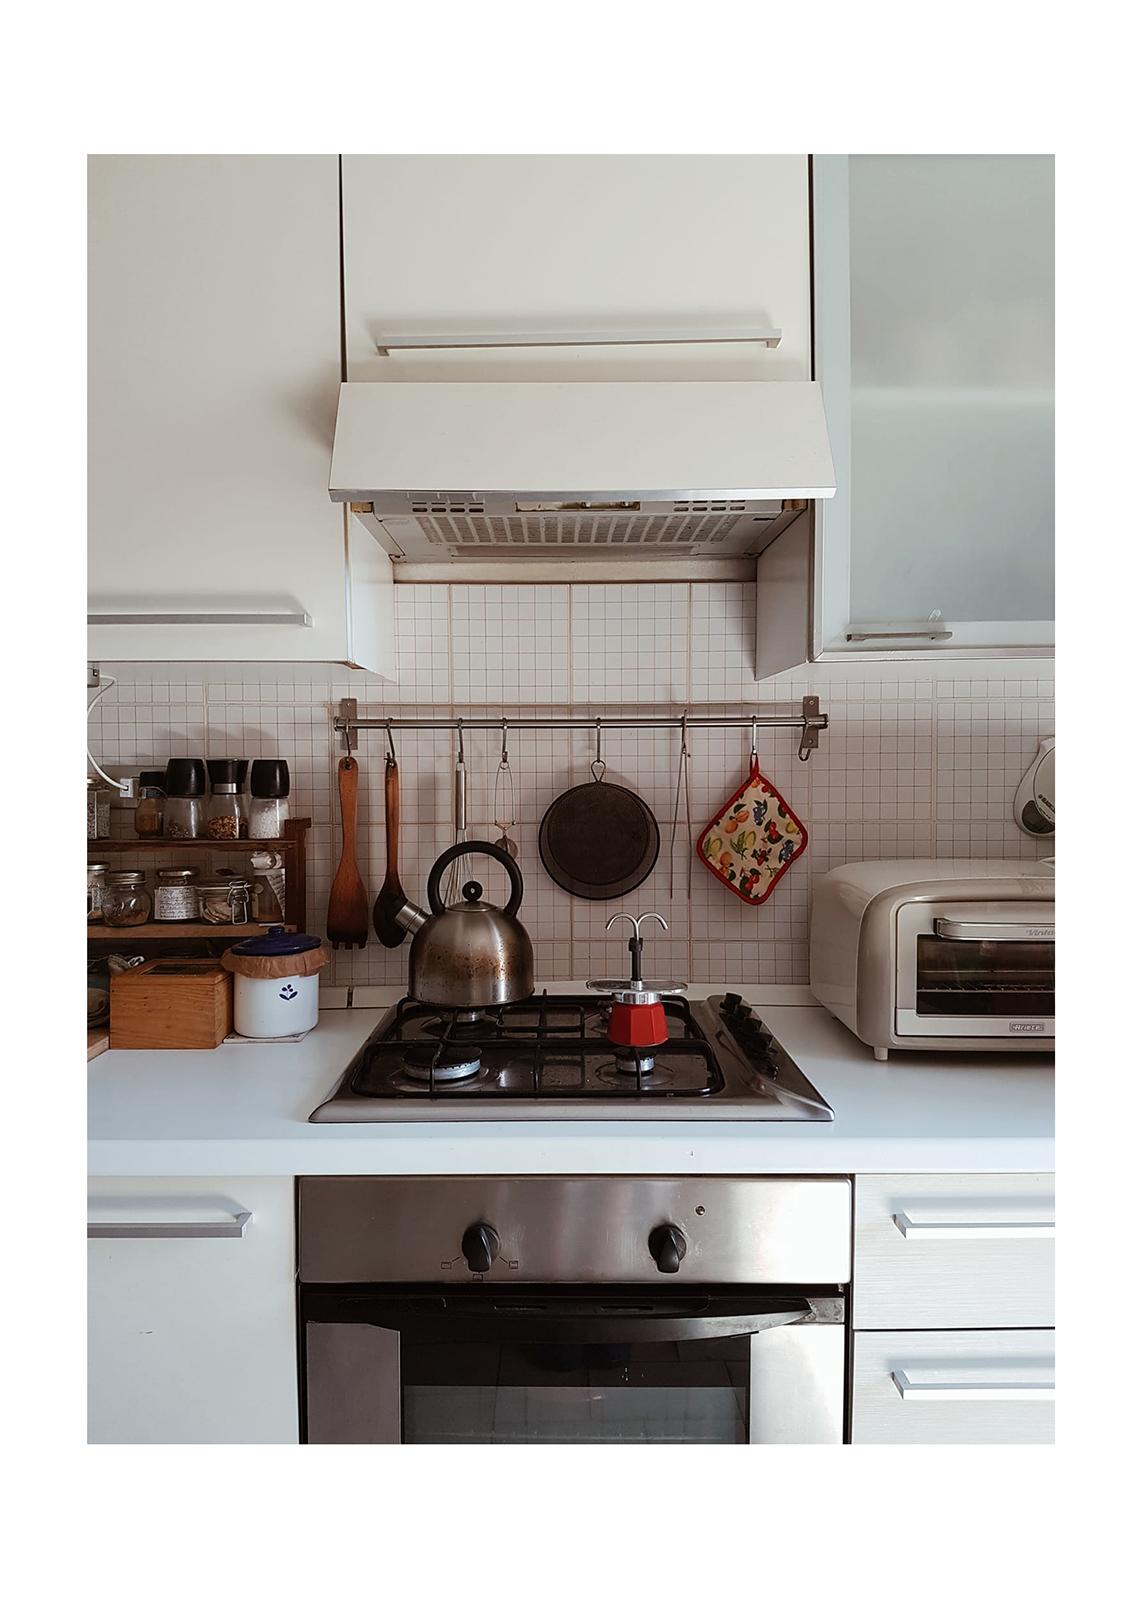 paola ressa cucine 9